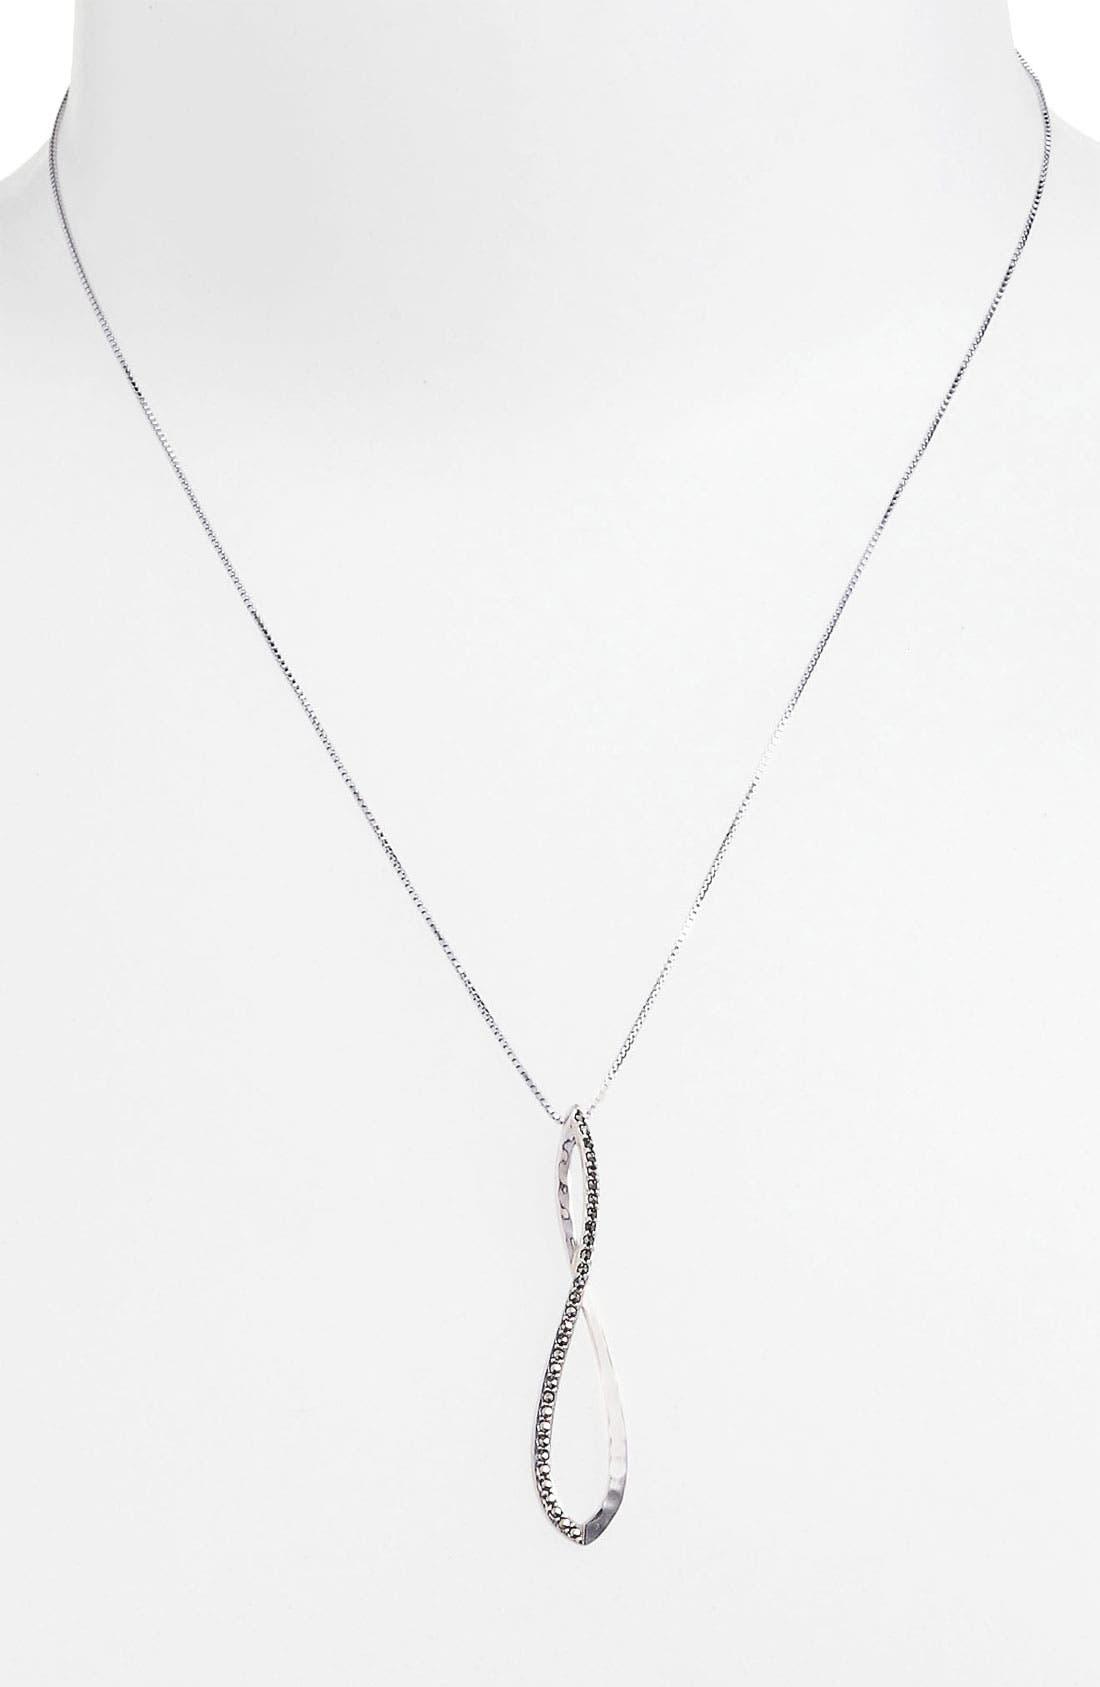 Main Image - Judith Jack 'Fluidity' Pendant Necklace